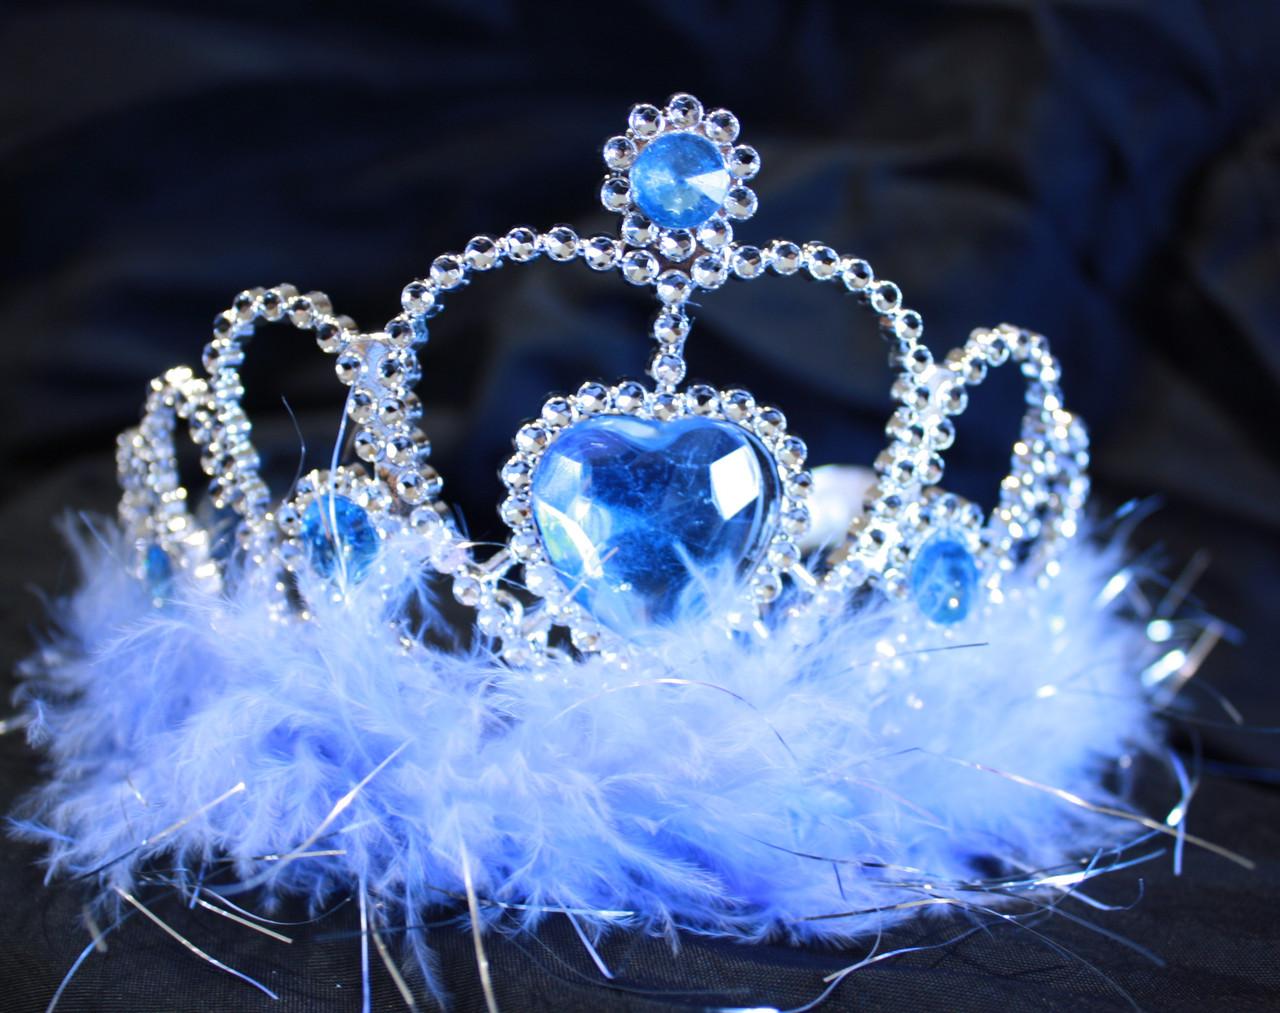 Light blue tiaras